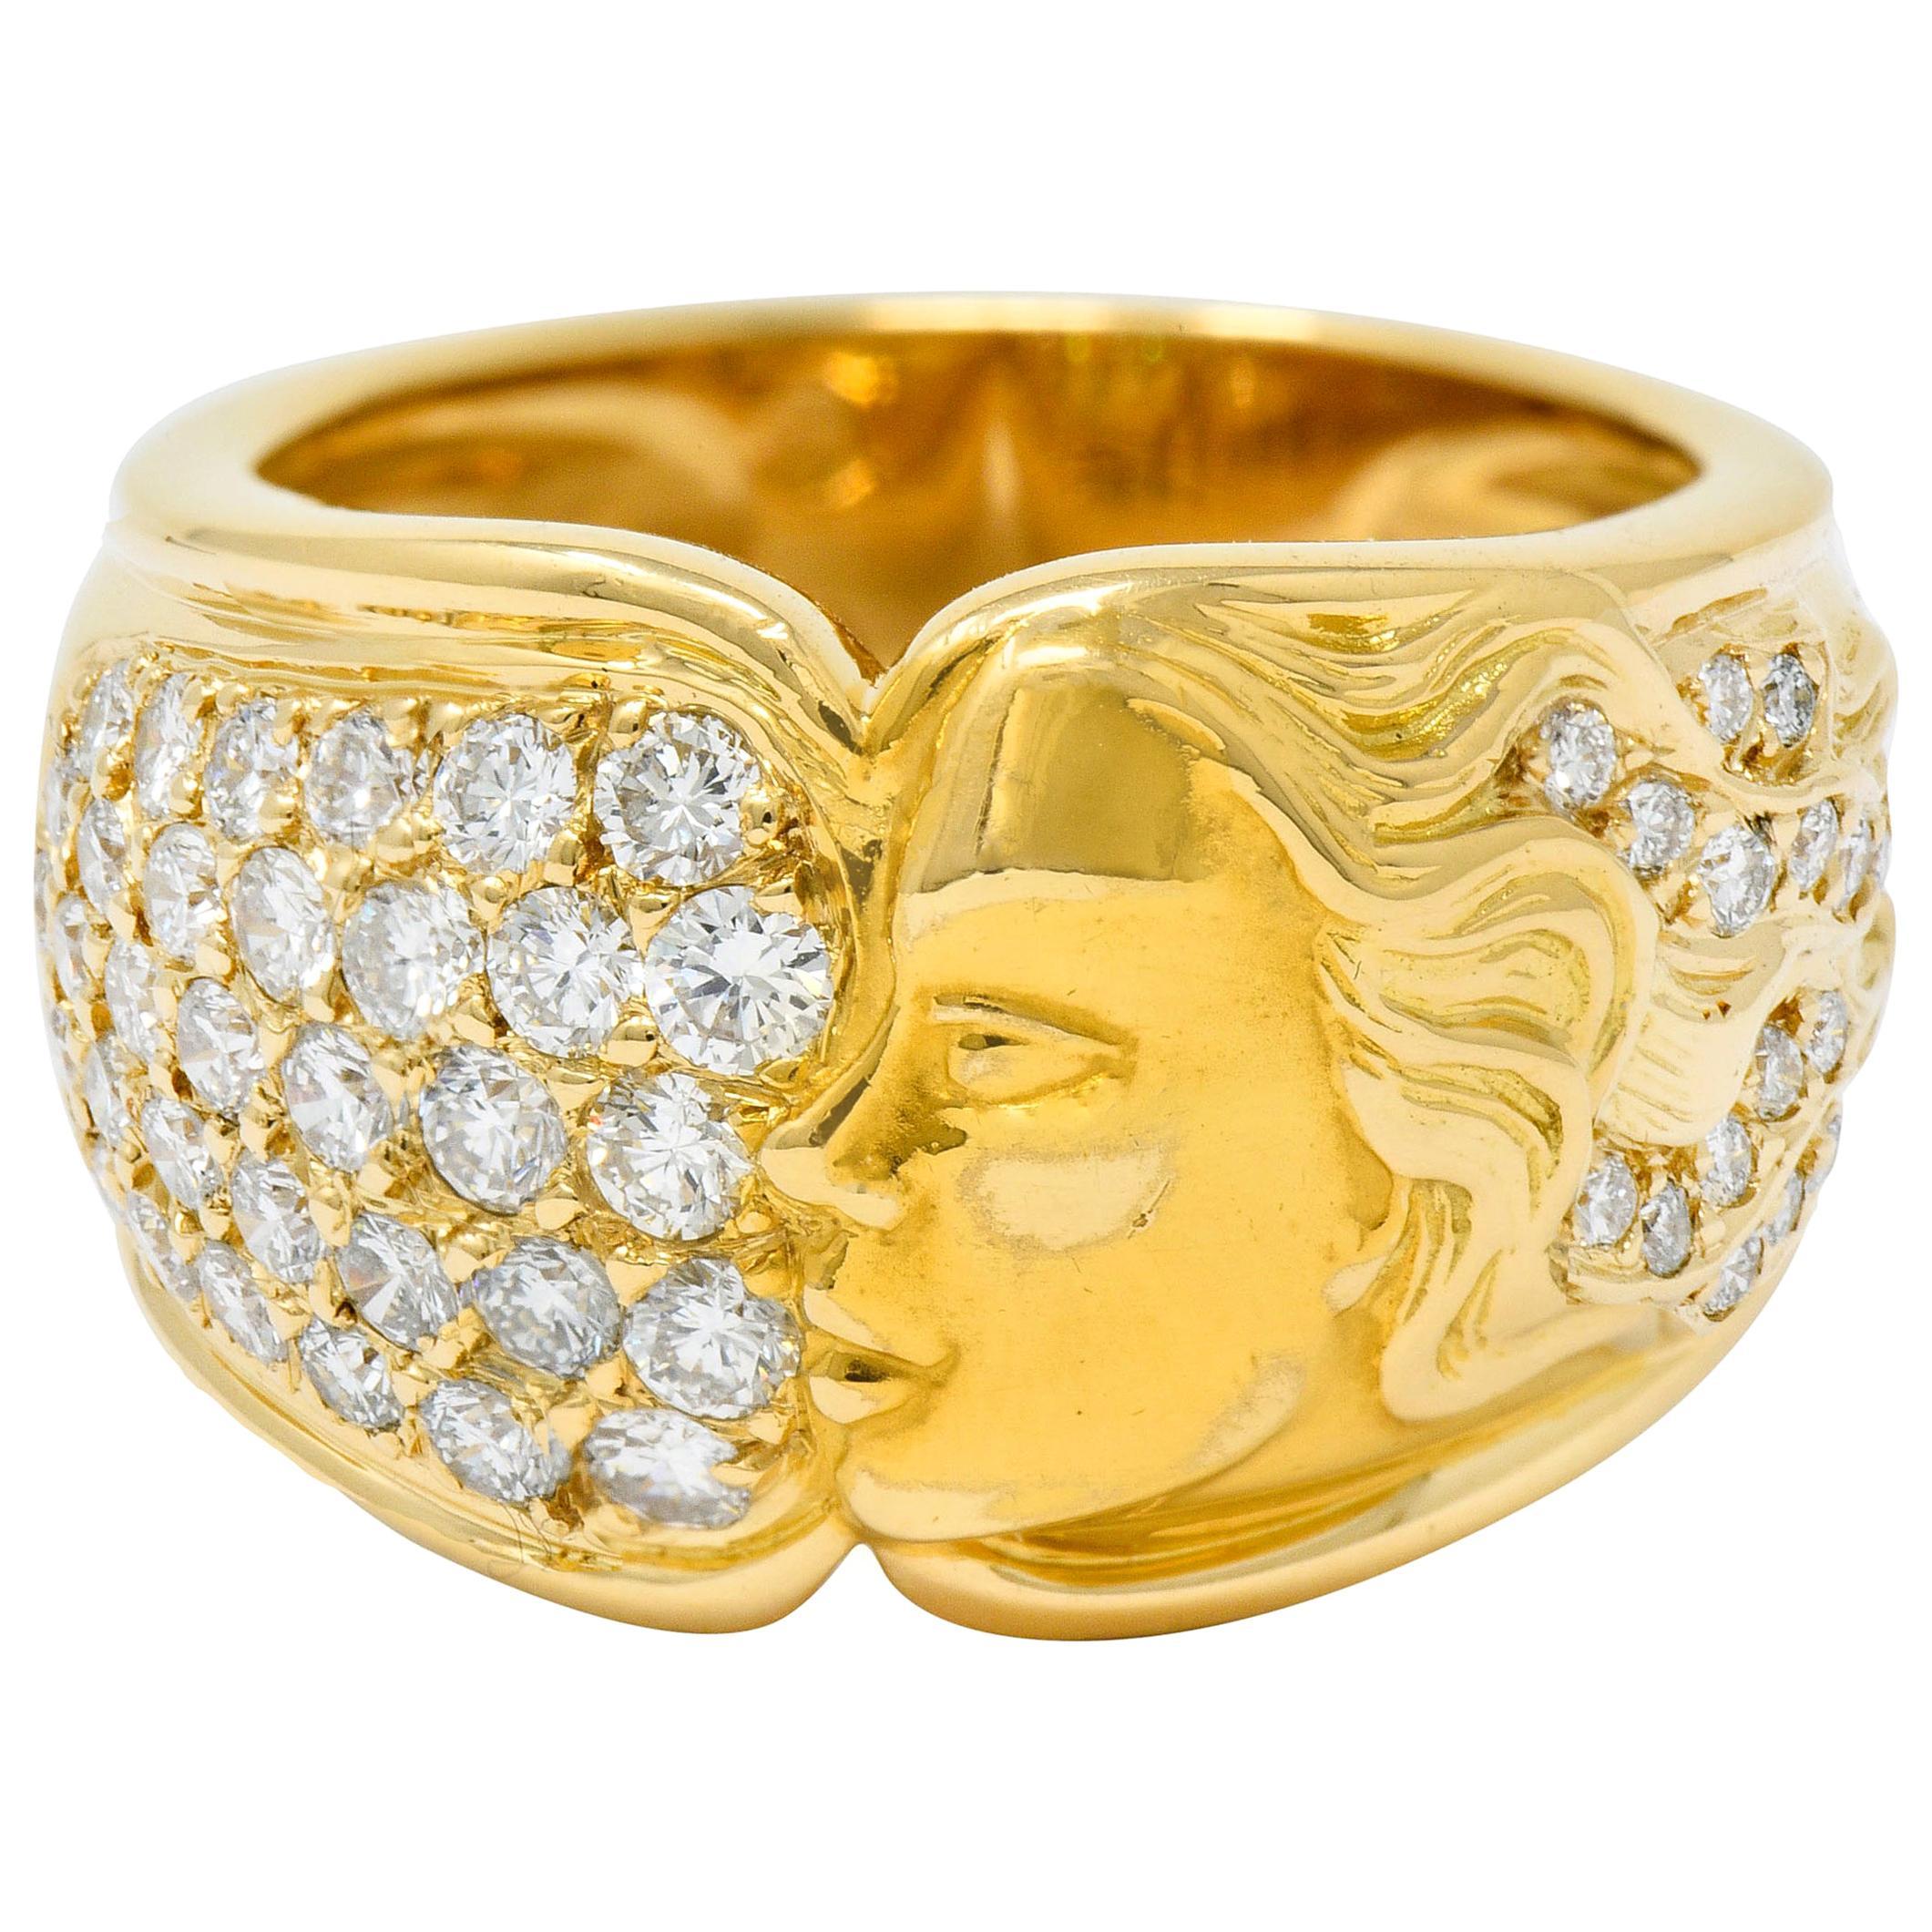 Carrera Y Carrera 1.50 Carat Pave Diamond 18 Karat Gold Promesa Lady Band Ring